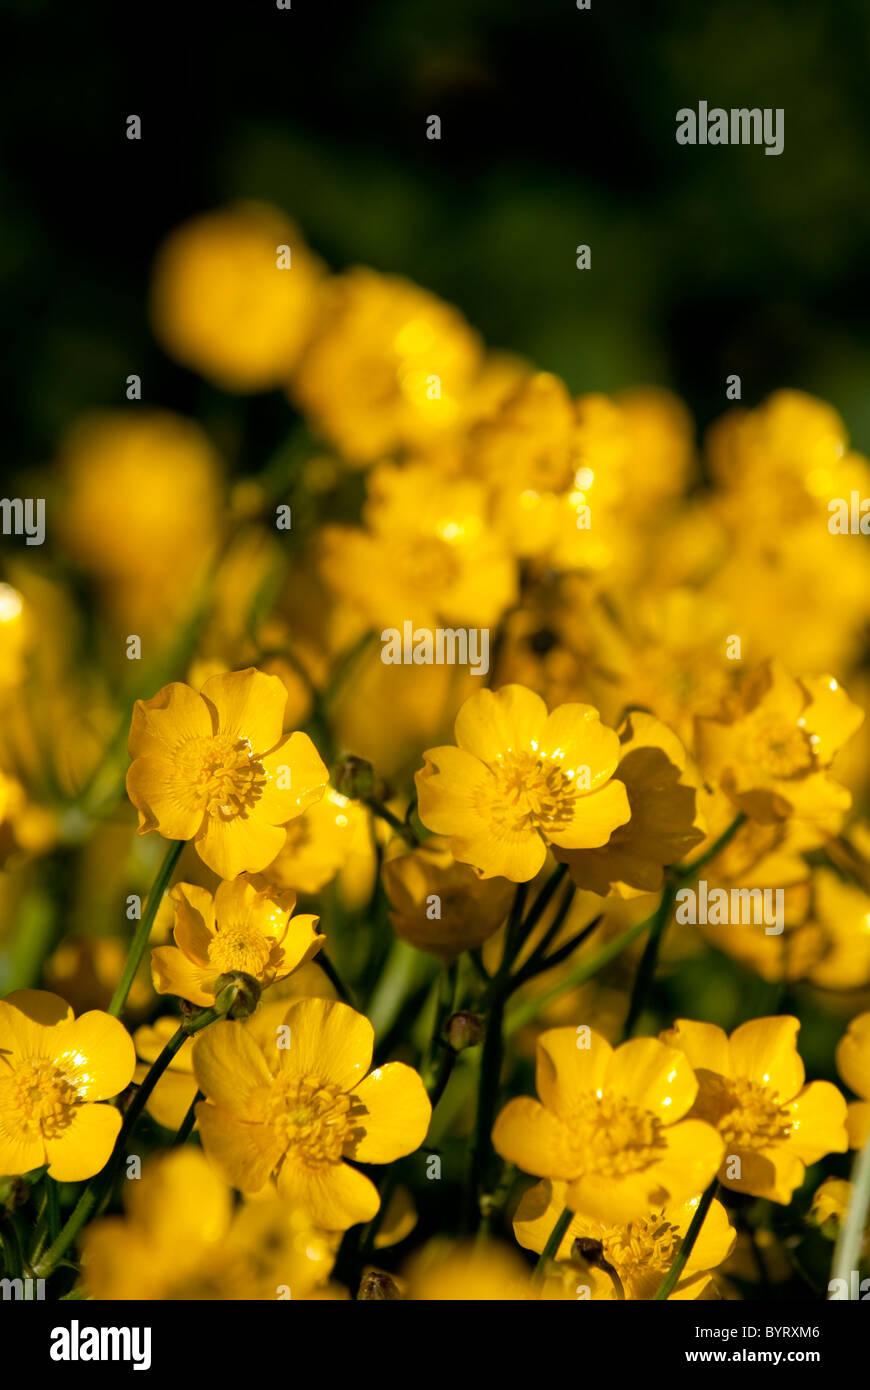 Field buttercups - Stock Image